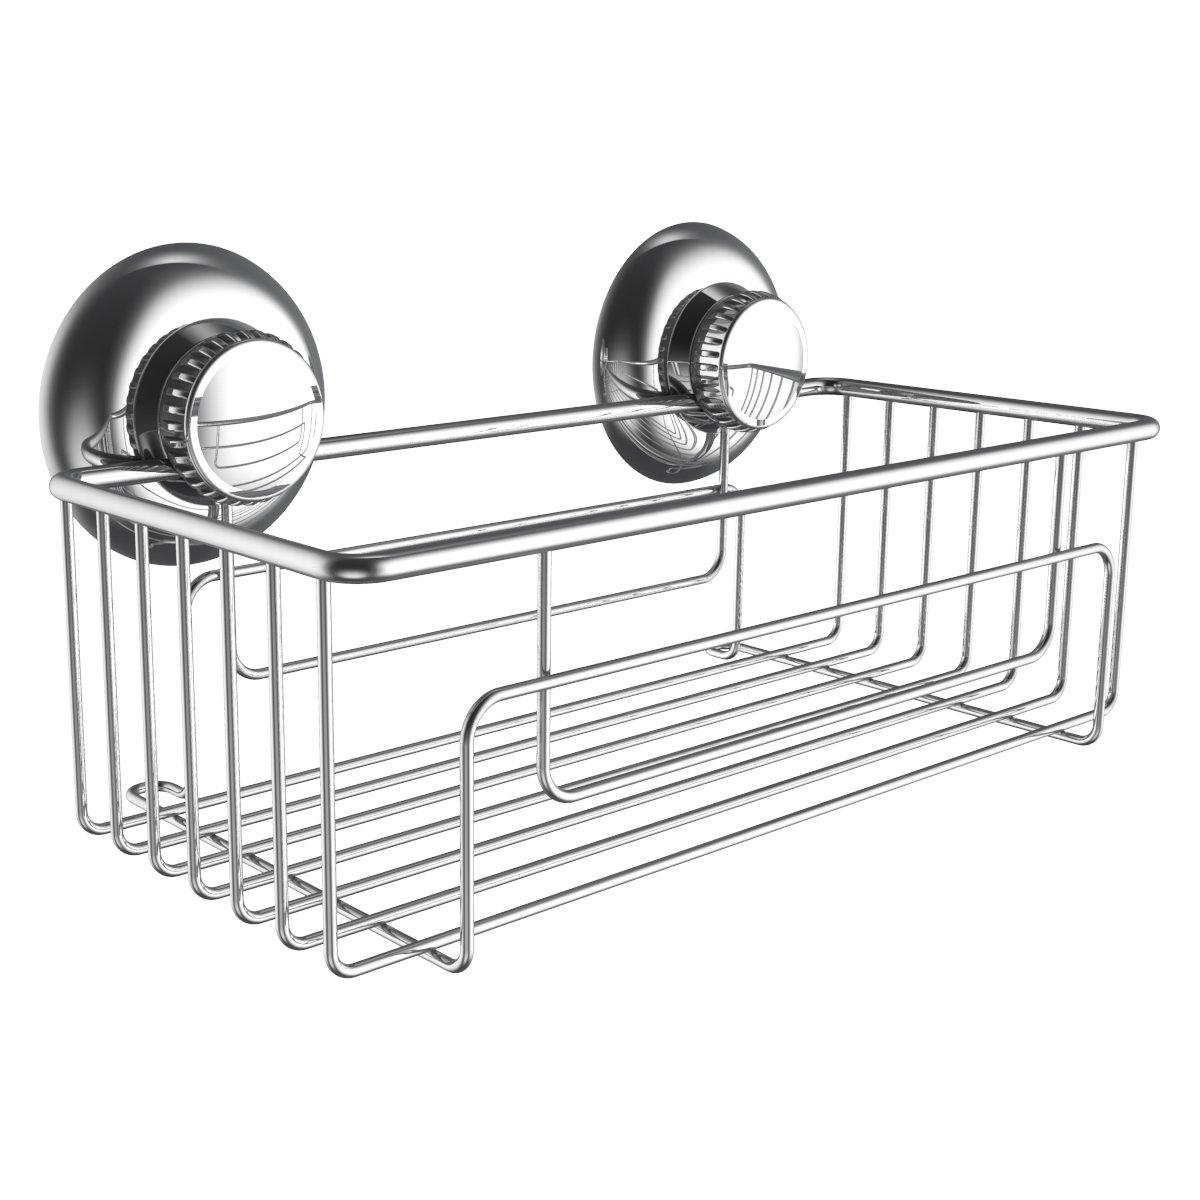 Amazon.com: Gecko-Loc Suction Cup Double Hooks Shower Accessory ...